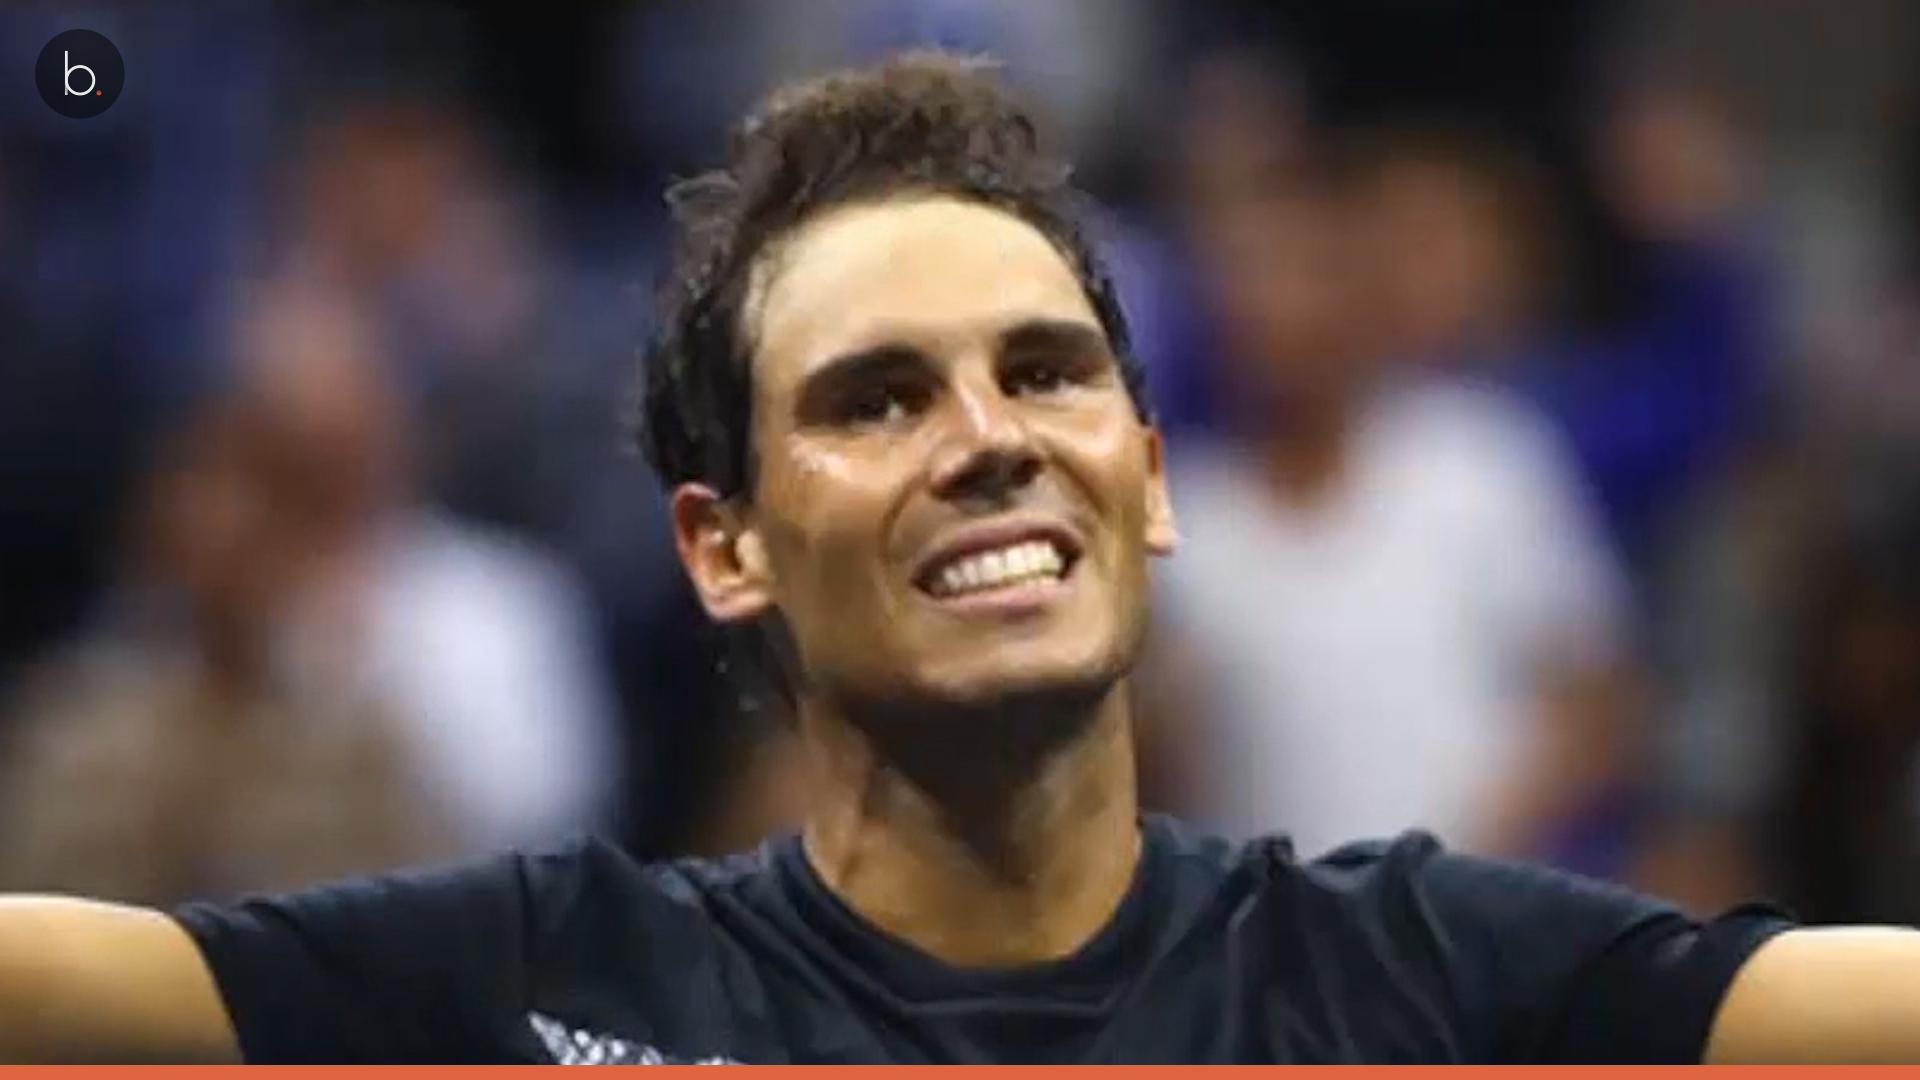 Nadal arrasa en la final del US Open